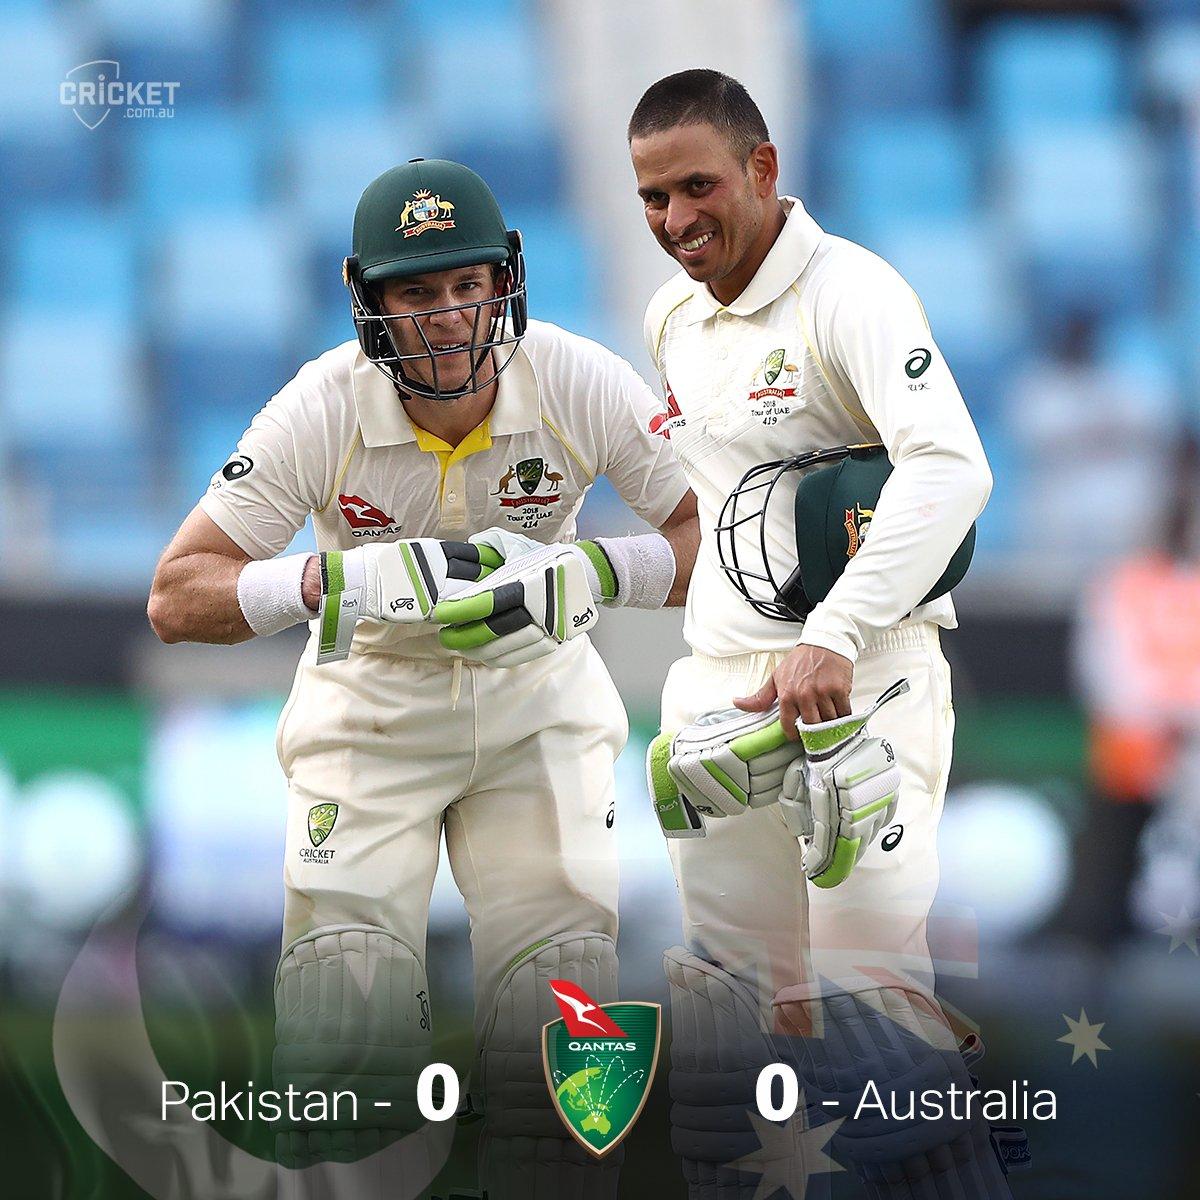 cricket.com.au's photo on Aussies